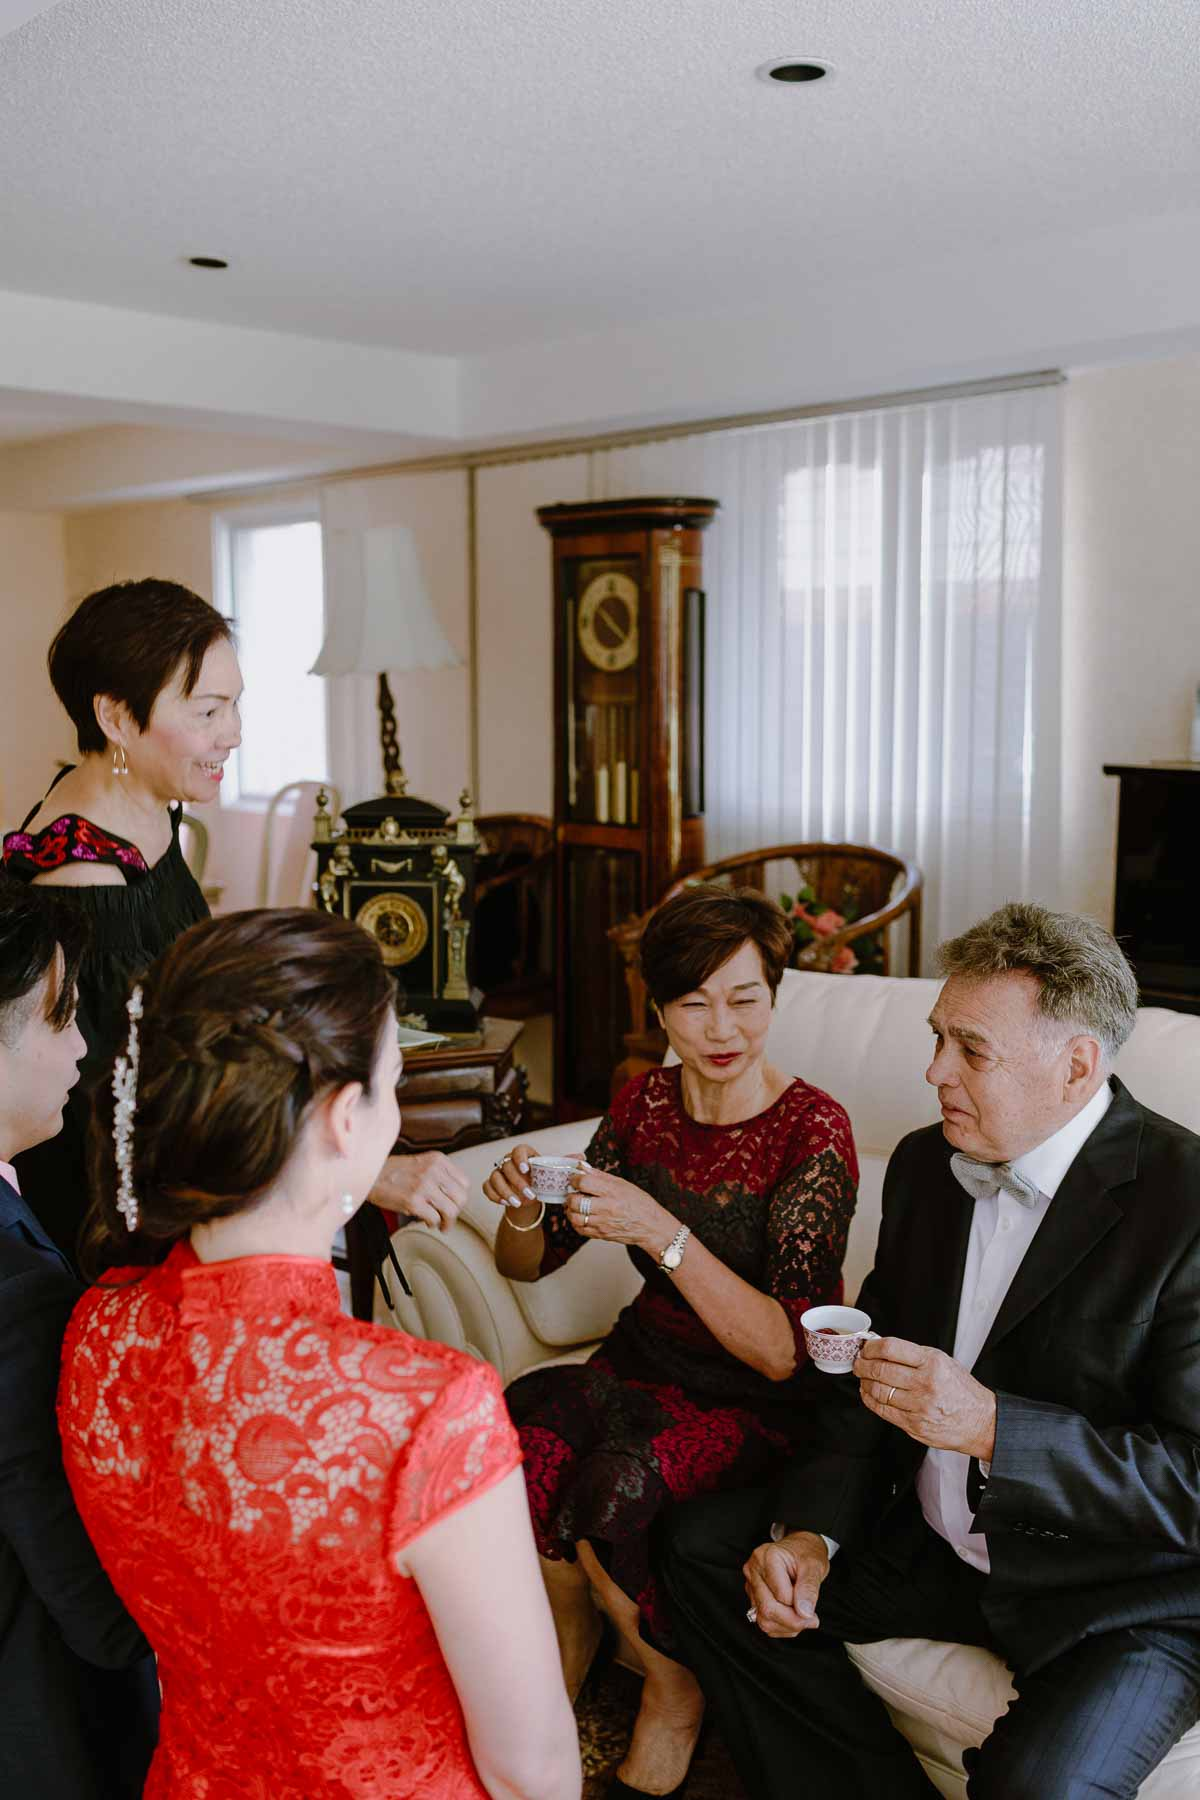 hilton-markham-wedding-toronto-chinese-wedding 0006.jpg